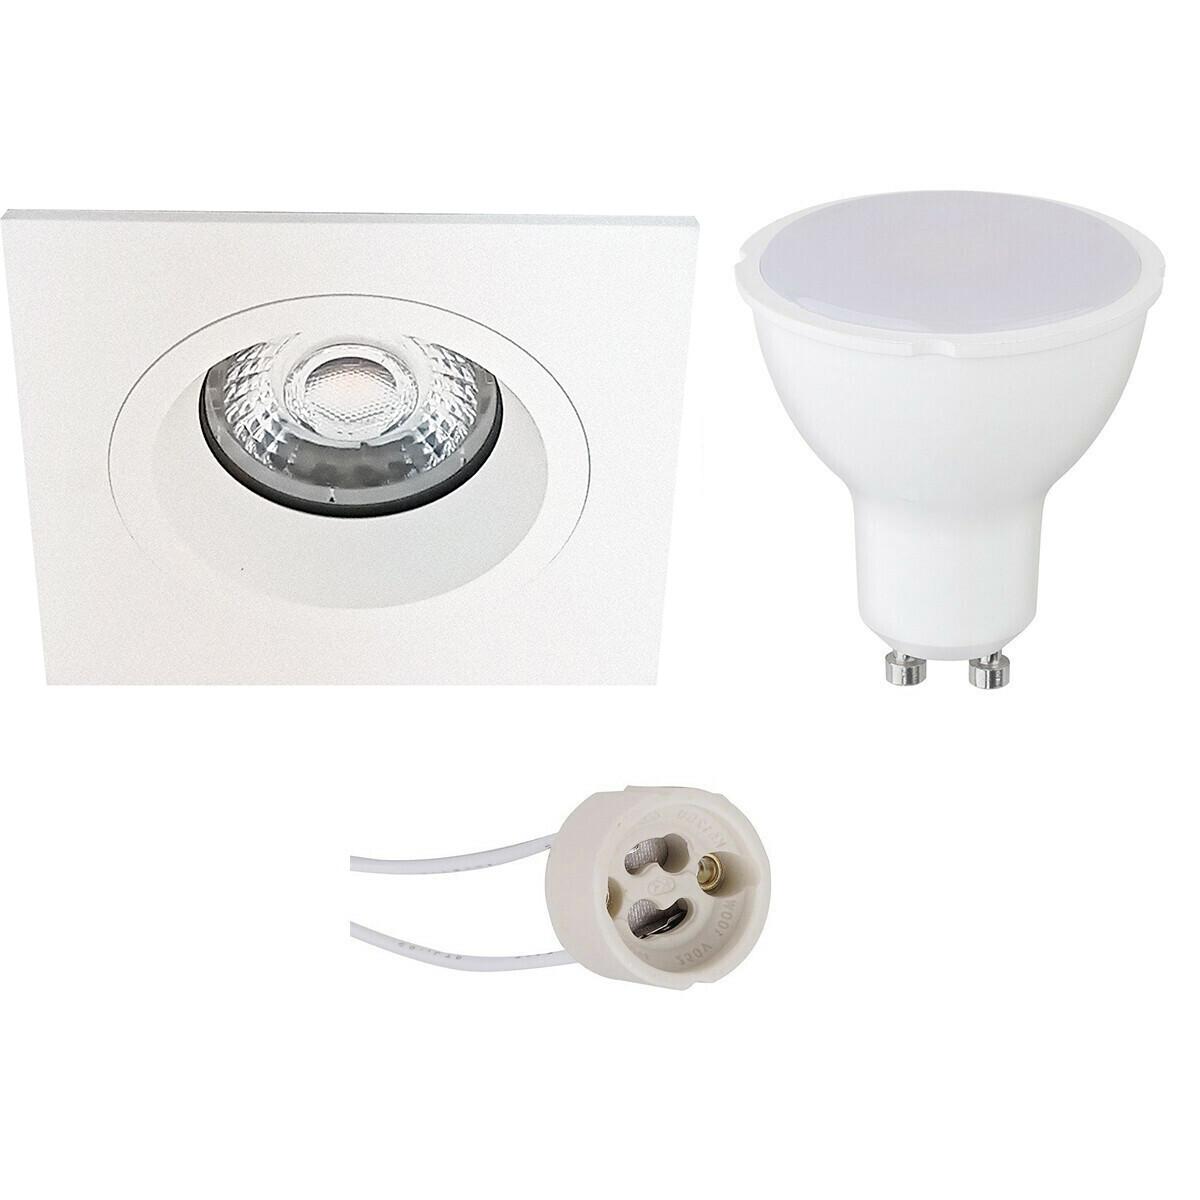 LED Spot Set - Aigi - Pragmi Rodos Pro - GU10 Fitting - Inbouw Vierkant - Mat Wit - 6W - Helder/Koud